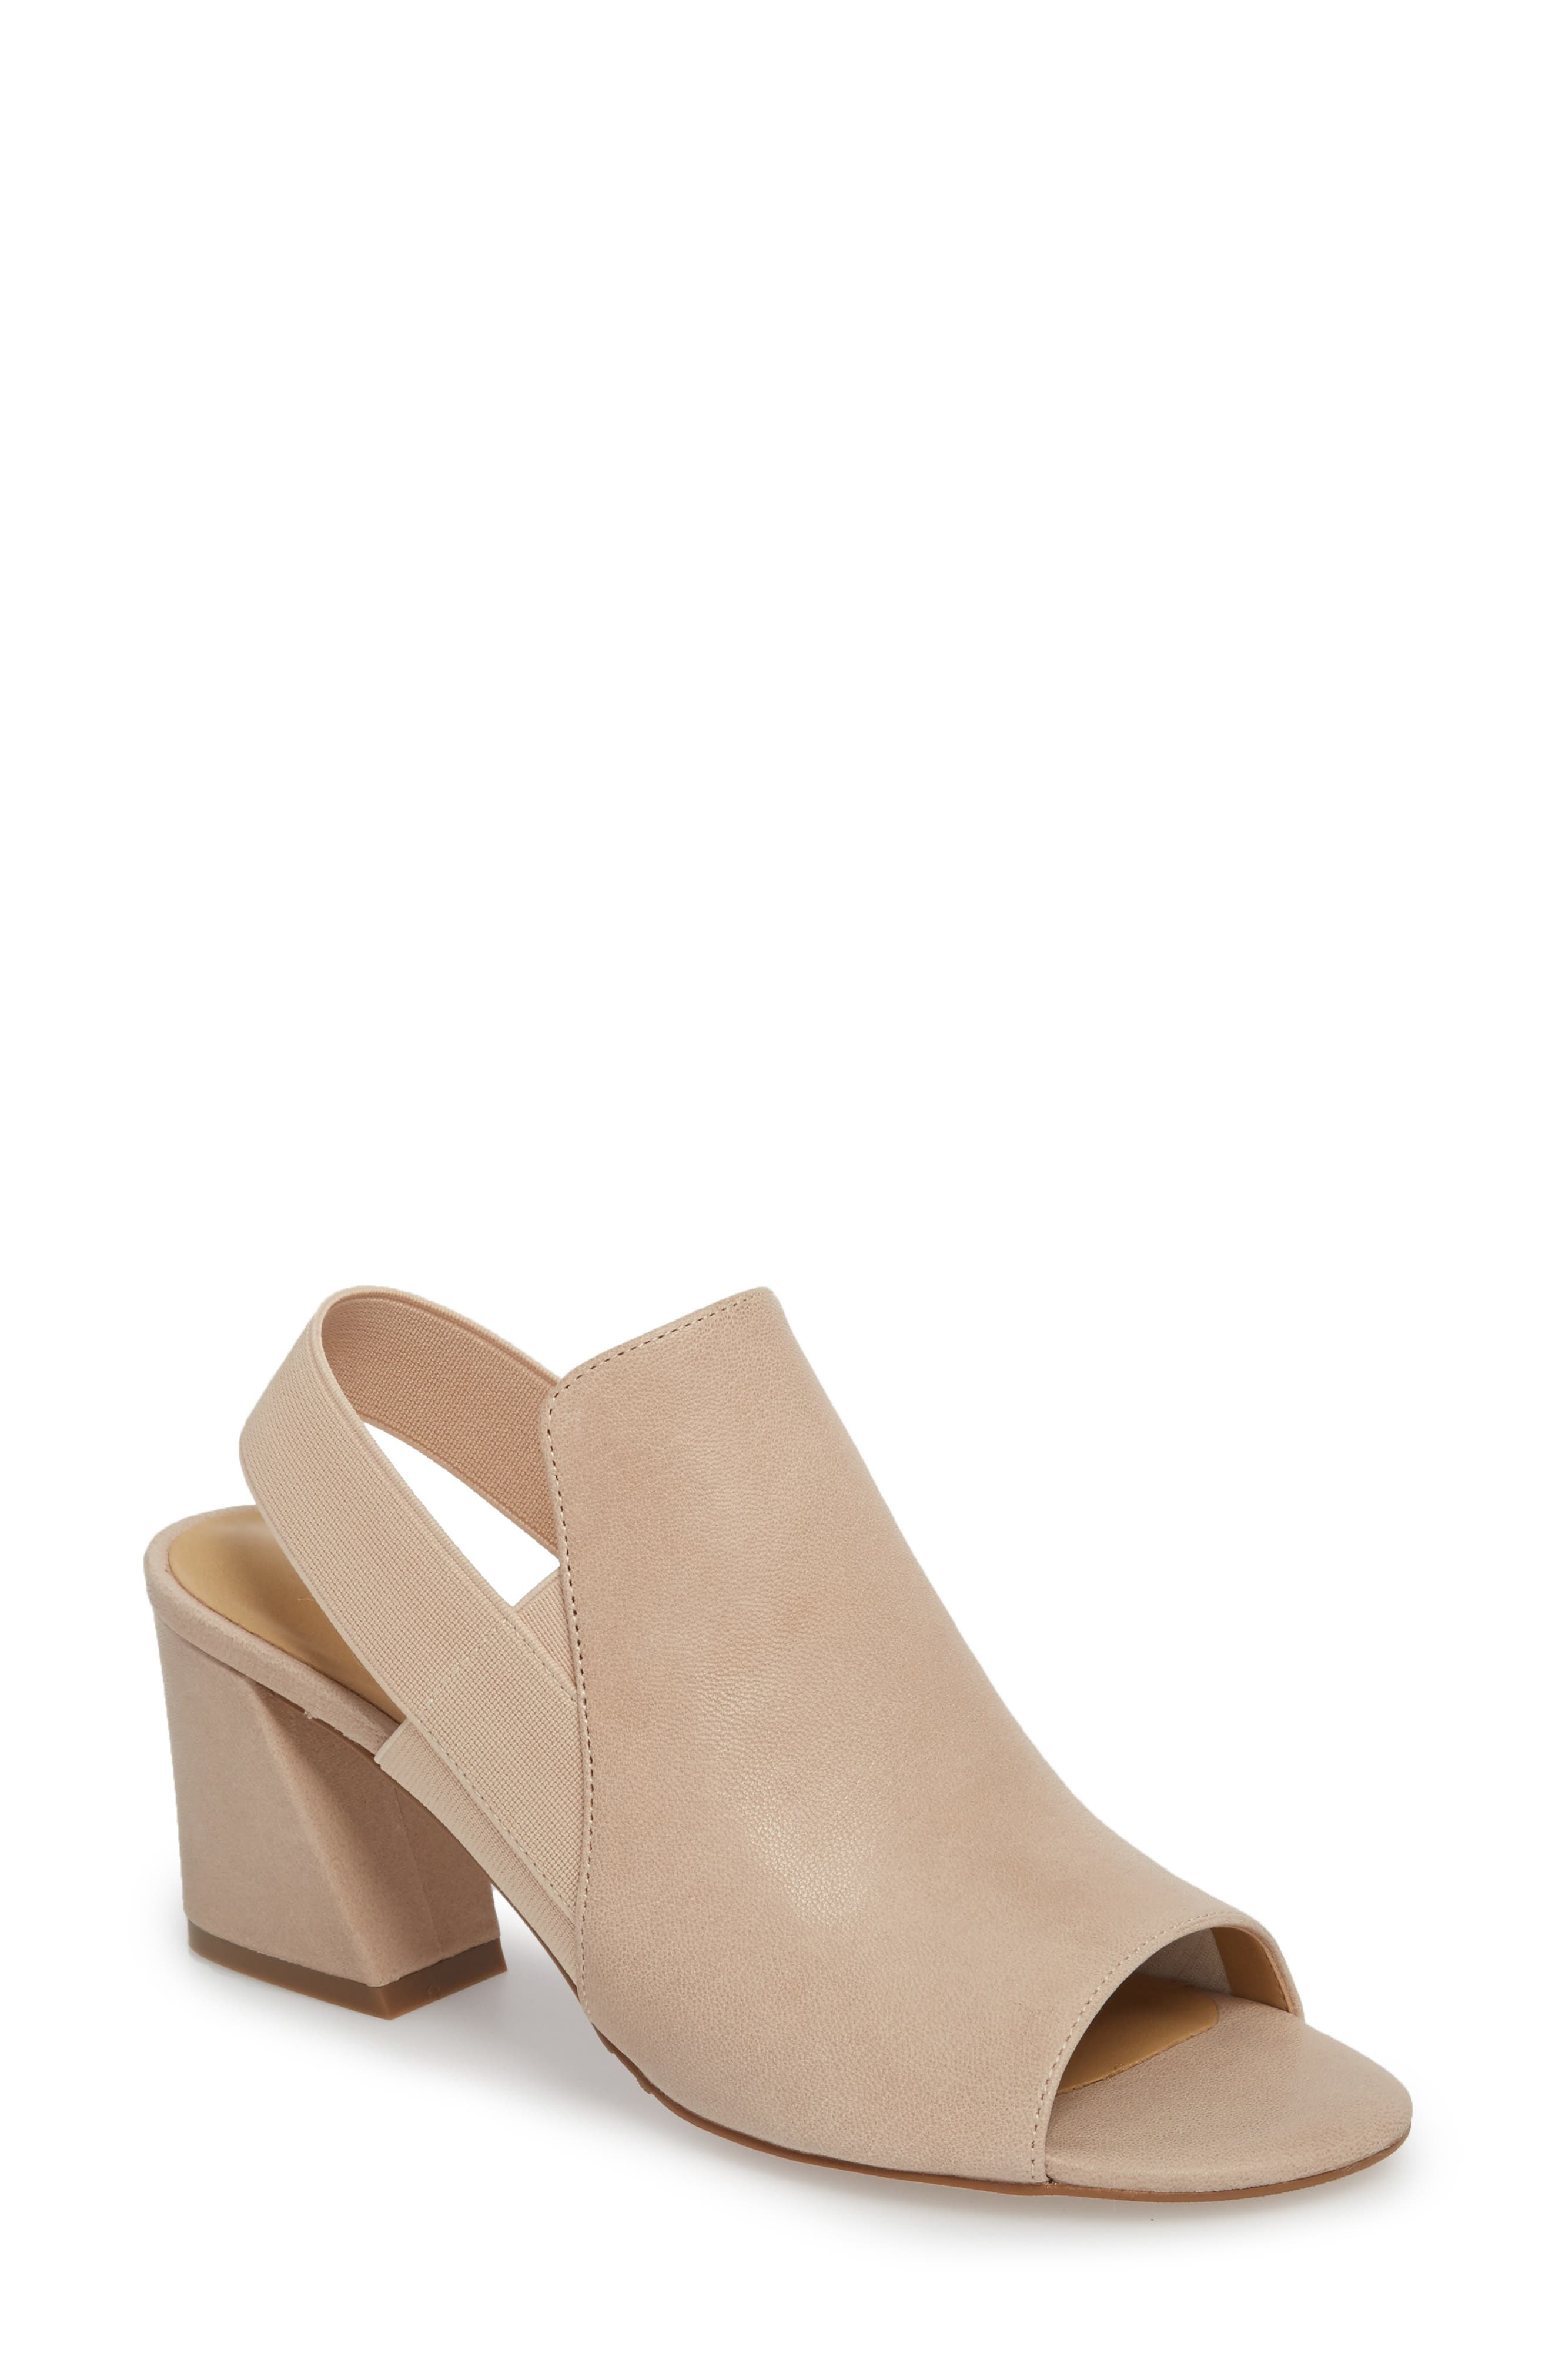 Berky Slingback Sandal,                         Main,                         color, 250